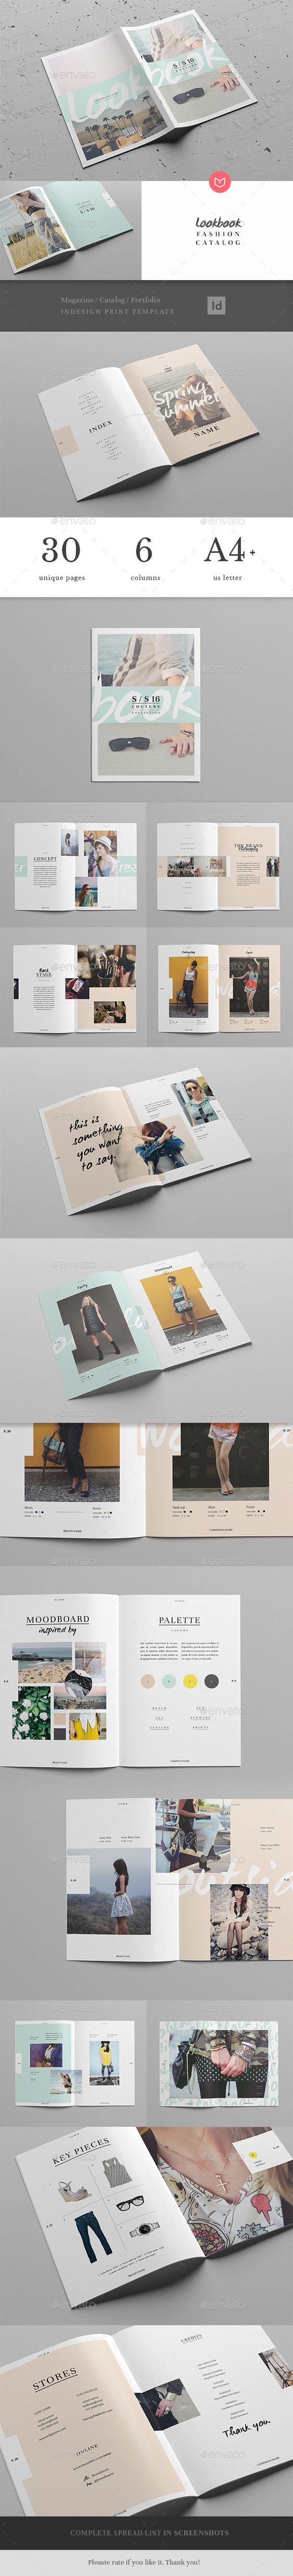 Lookbook / Fashion Magazine + Catalogue Template #design Download: http://graphicriver.net/item/lookbook-fashion-magazine-catalogue/12444832?ref=ksioks: